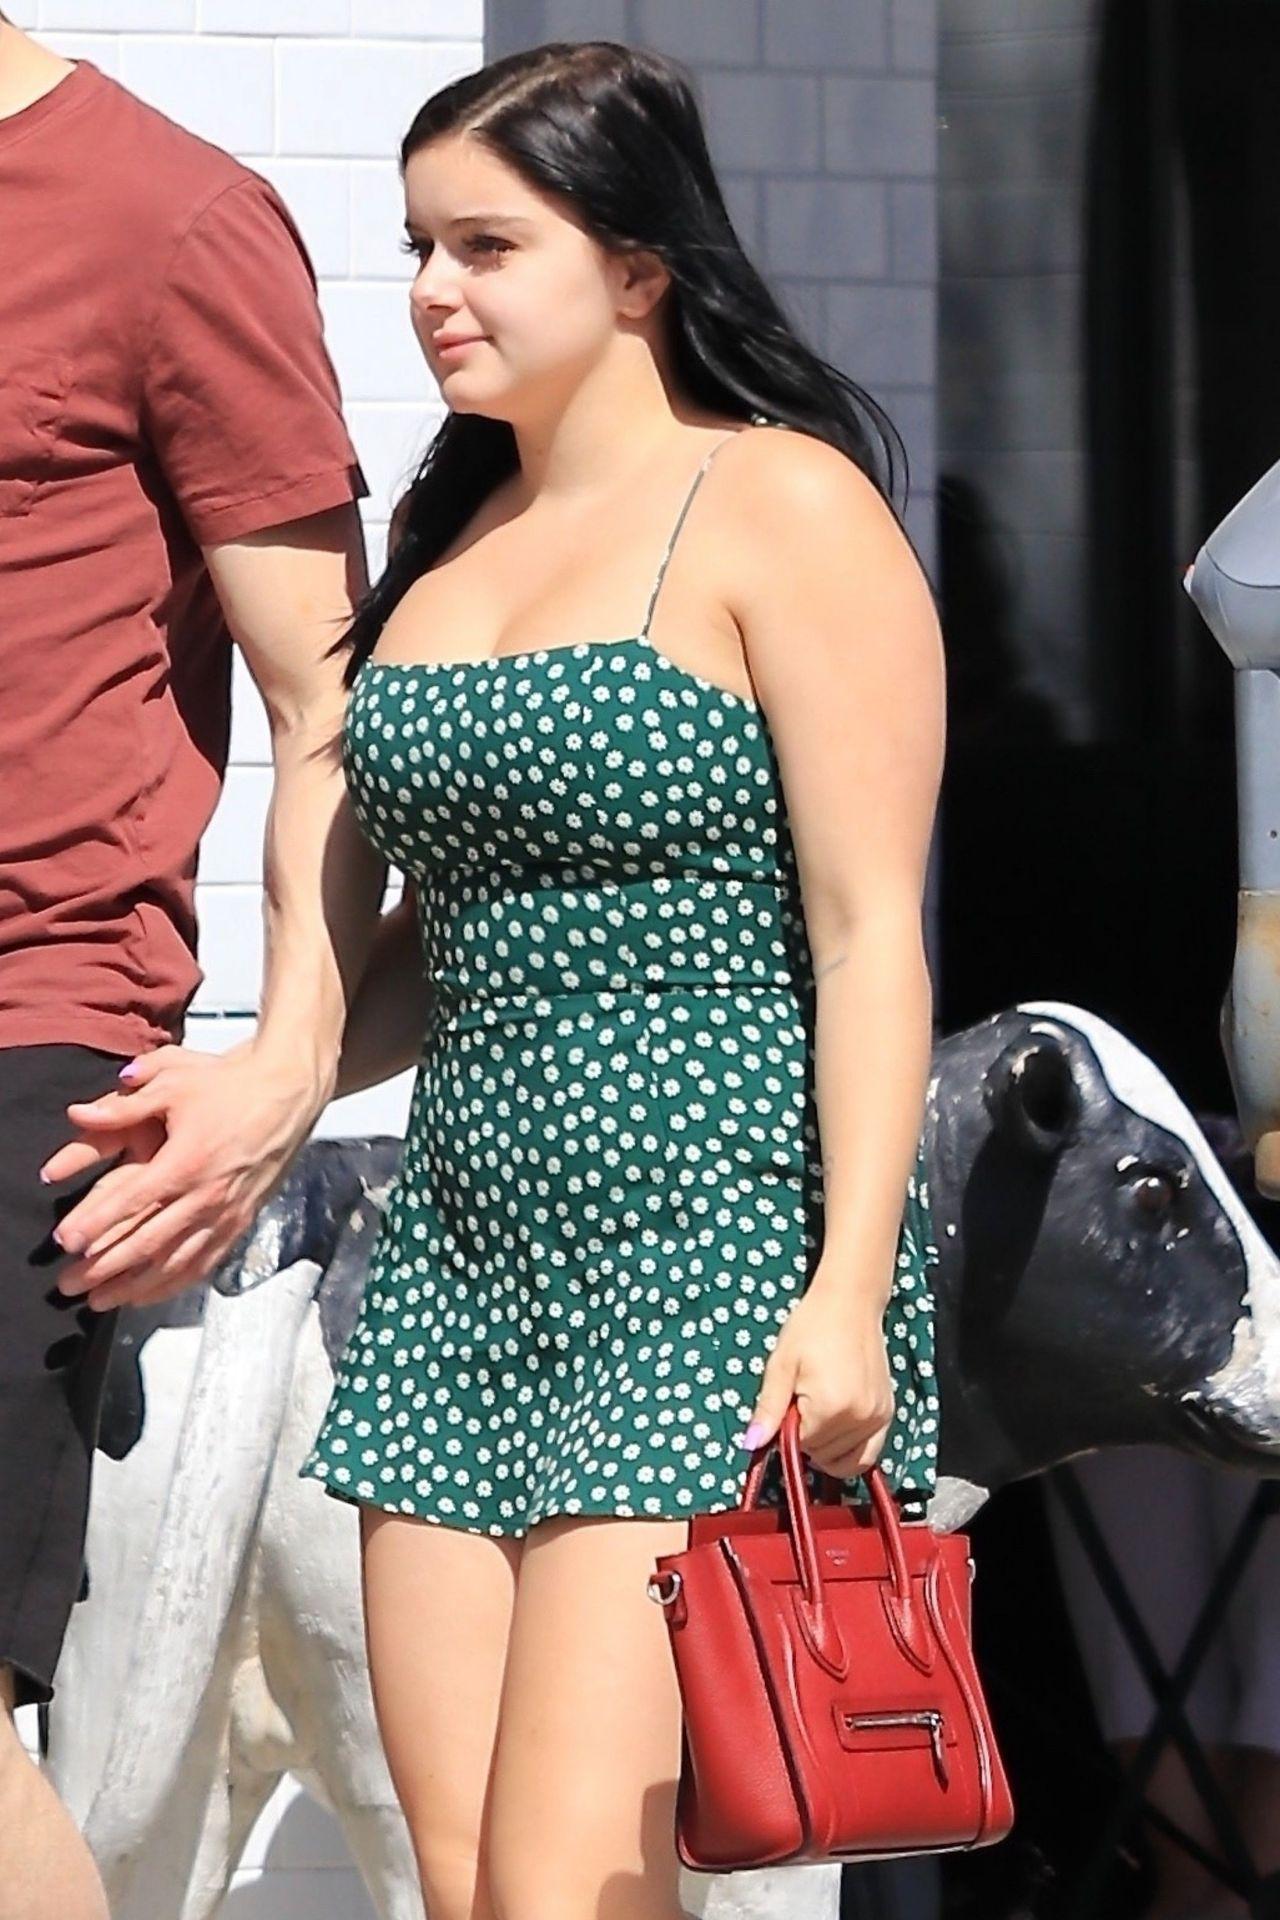 Ambyr Reyes ariel winter - shopping with her boyfriend in studio city 04